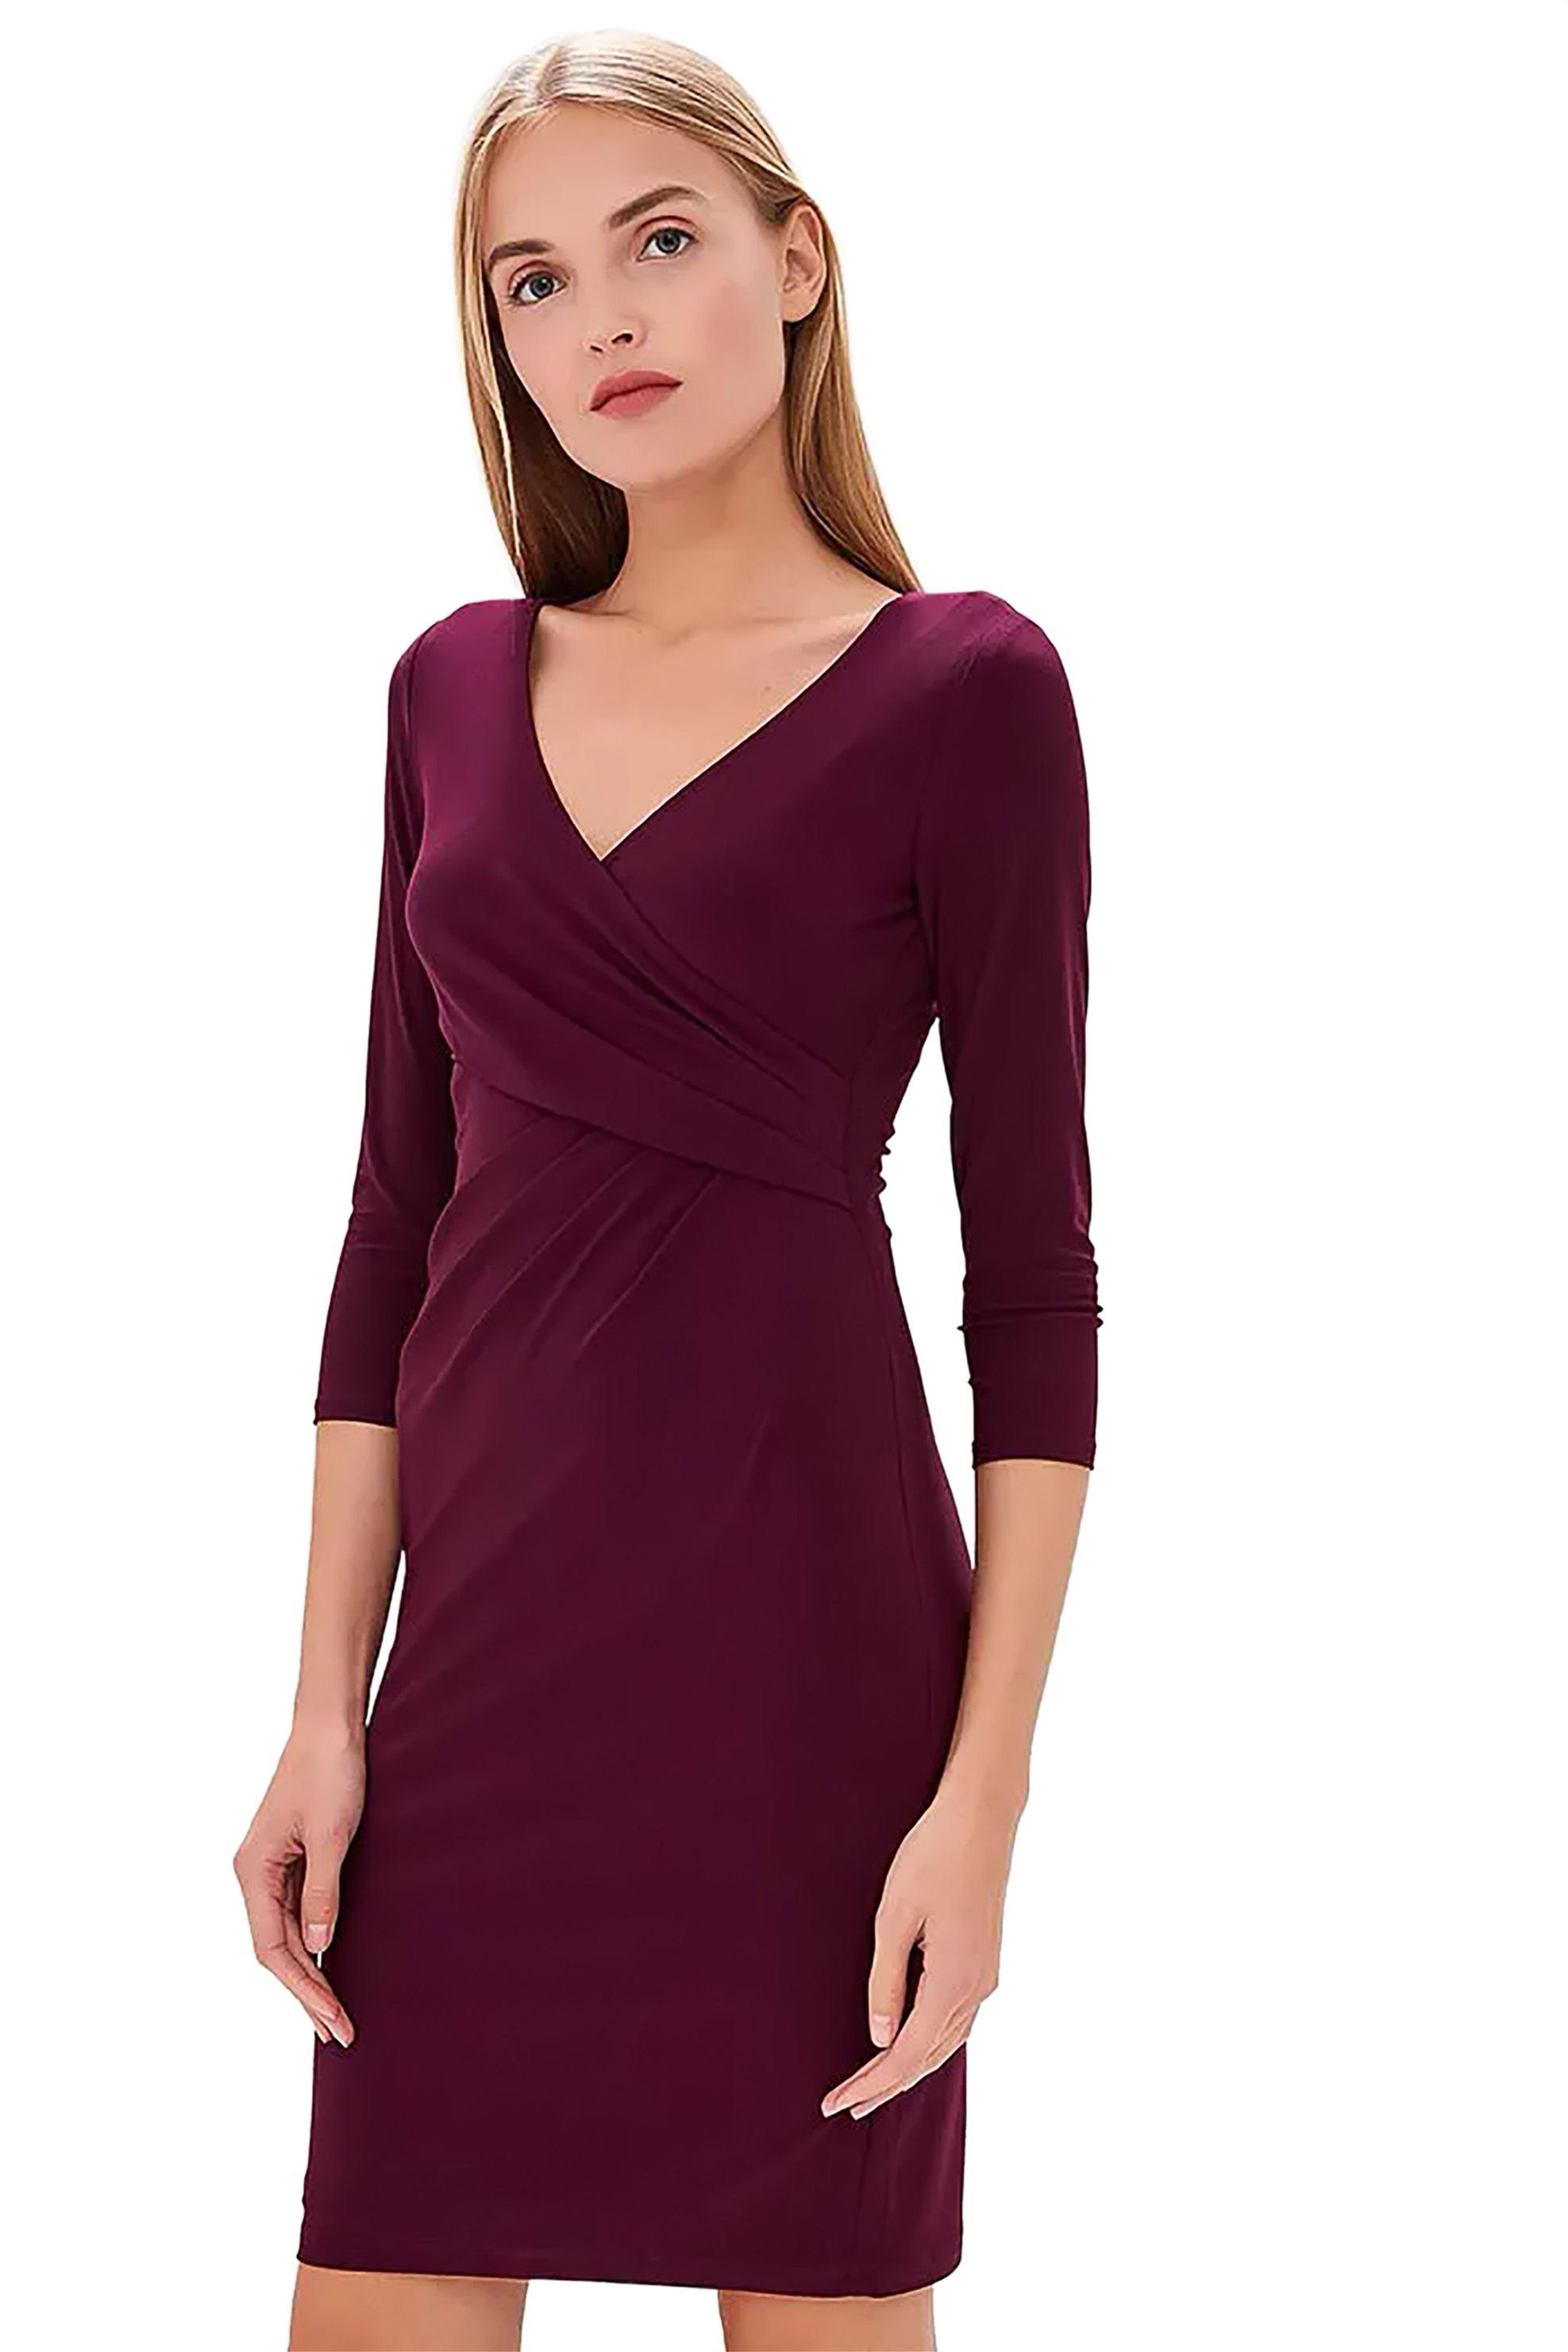 eb7f7f6264b4 Lauren Ralph Lauren Γυναικείο Φόρεμα Μονόχρωμο Κρουαζέ - 250725177001 - Μπλε  Σκούρο Notos